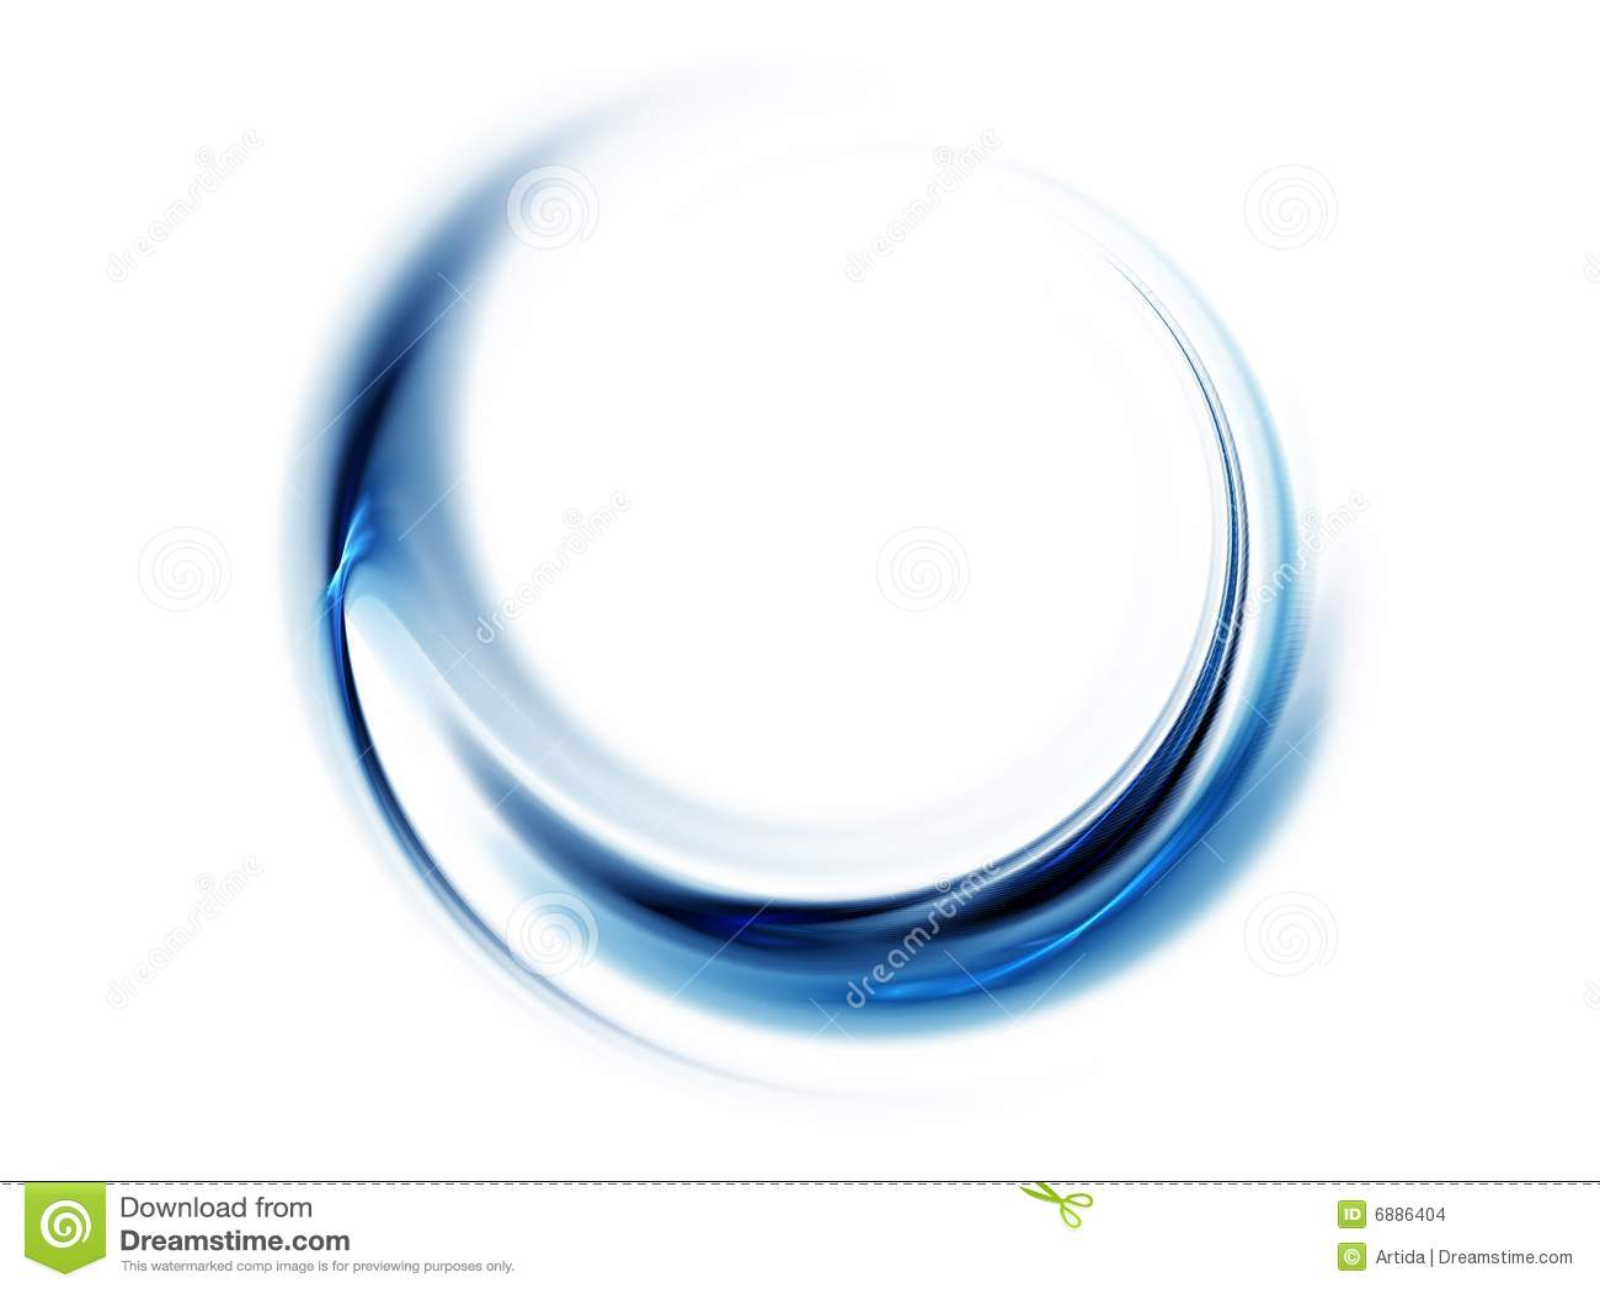 3d Curved Wallpaper L 237 Neas Abstractas Onduladas Azules En El Fondo Blanco